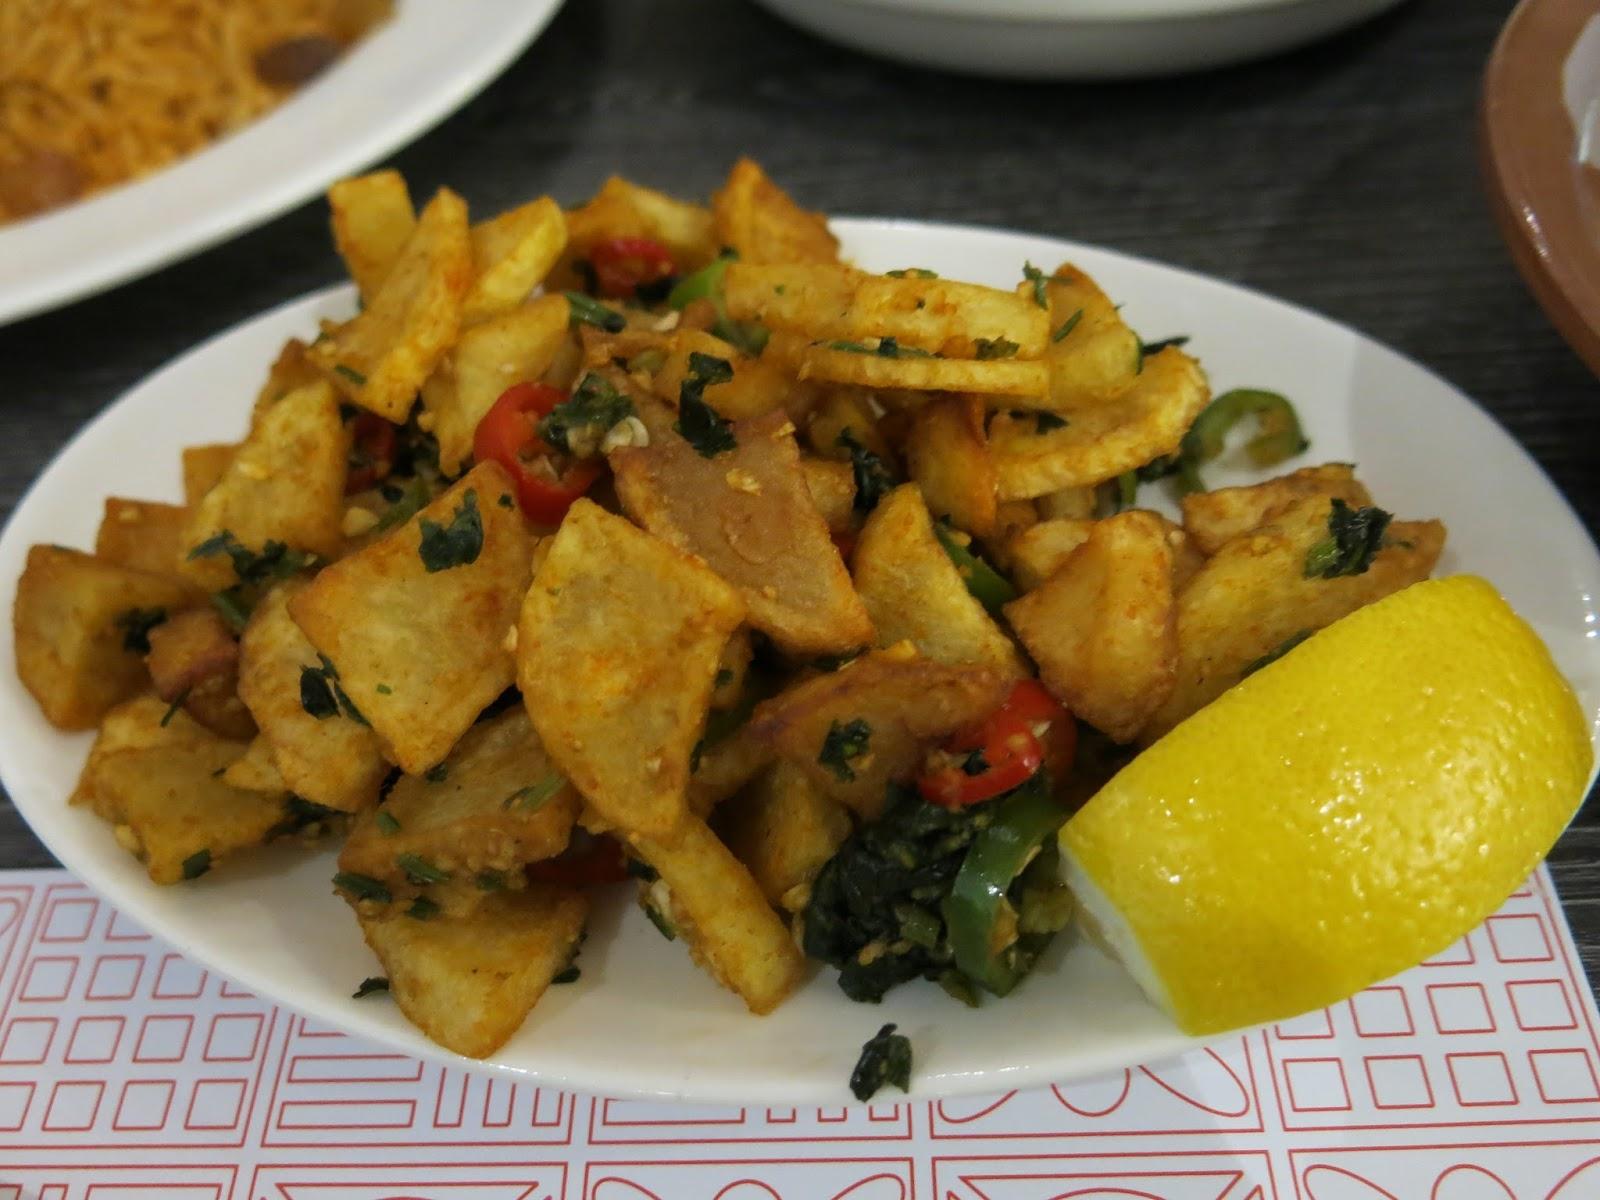 Choypengism al amar lebanese cuisine sunway putra for Al amar lebanese cuisine